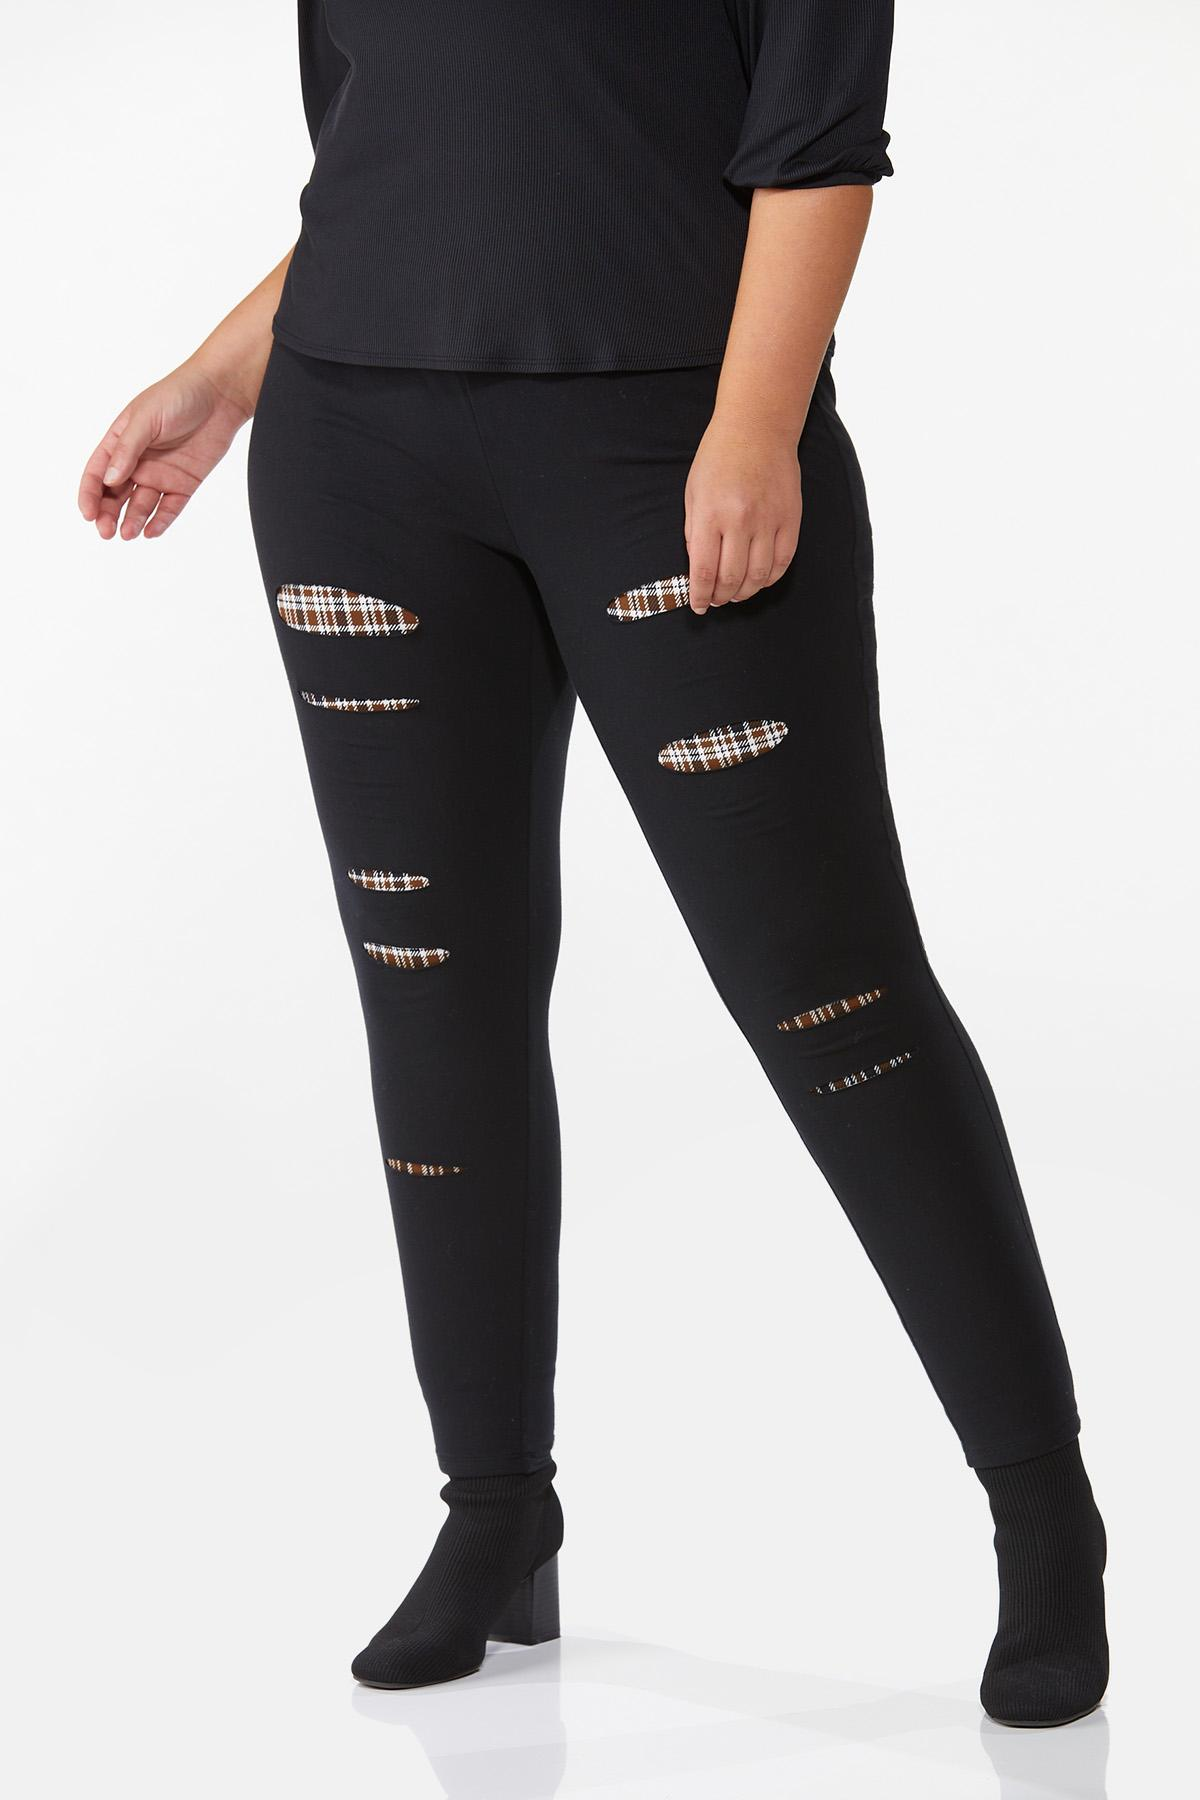 Plus Size Distressed Plaid Back Leggings